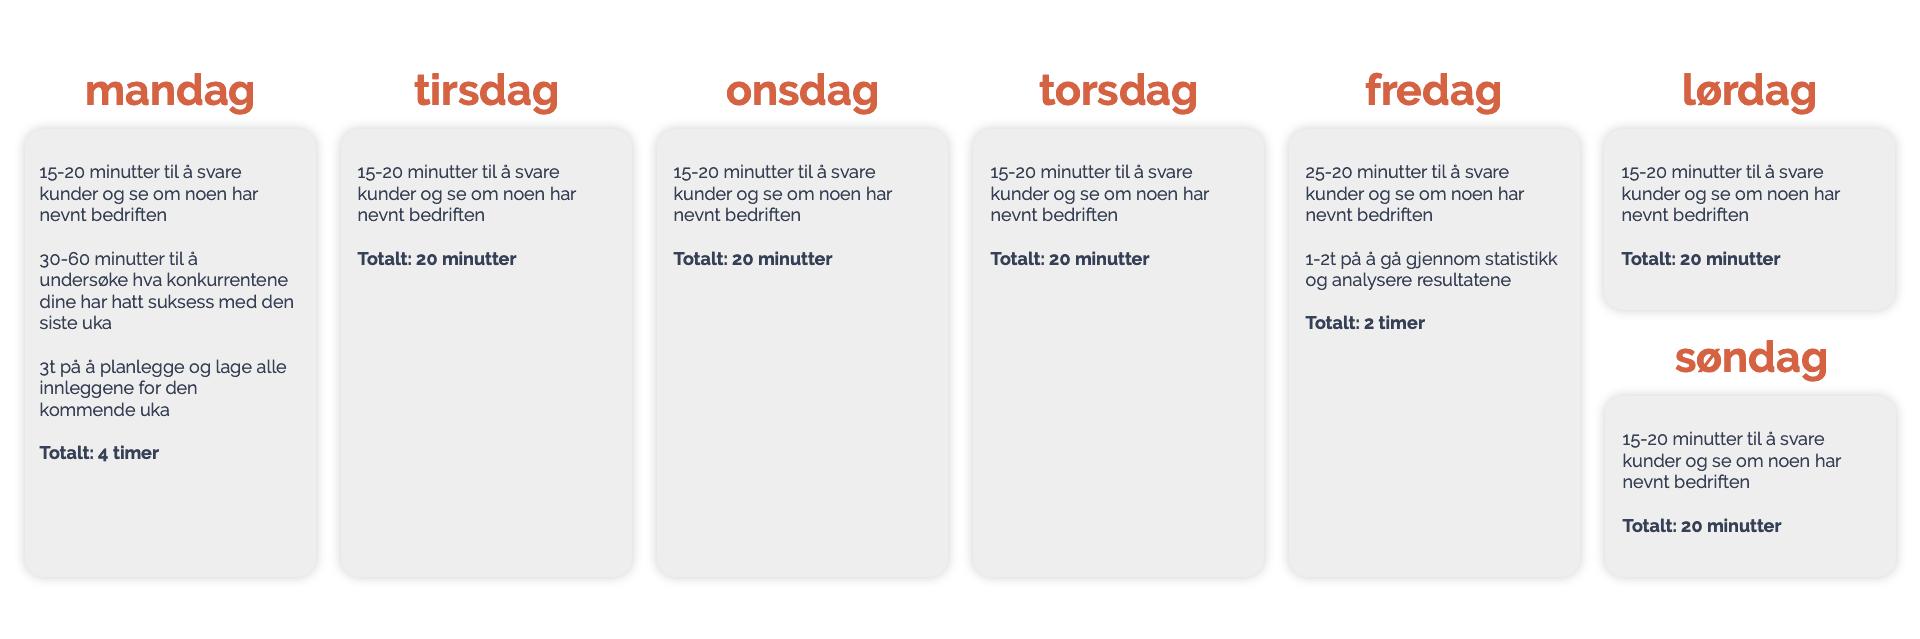 Sosiale medier: kalender